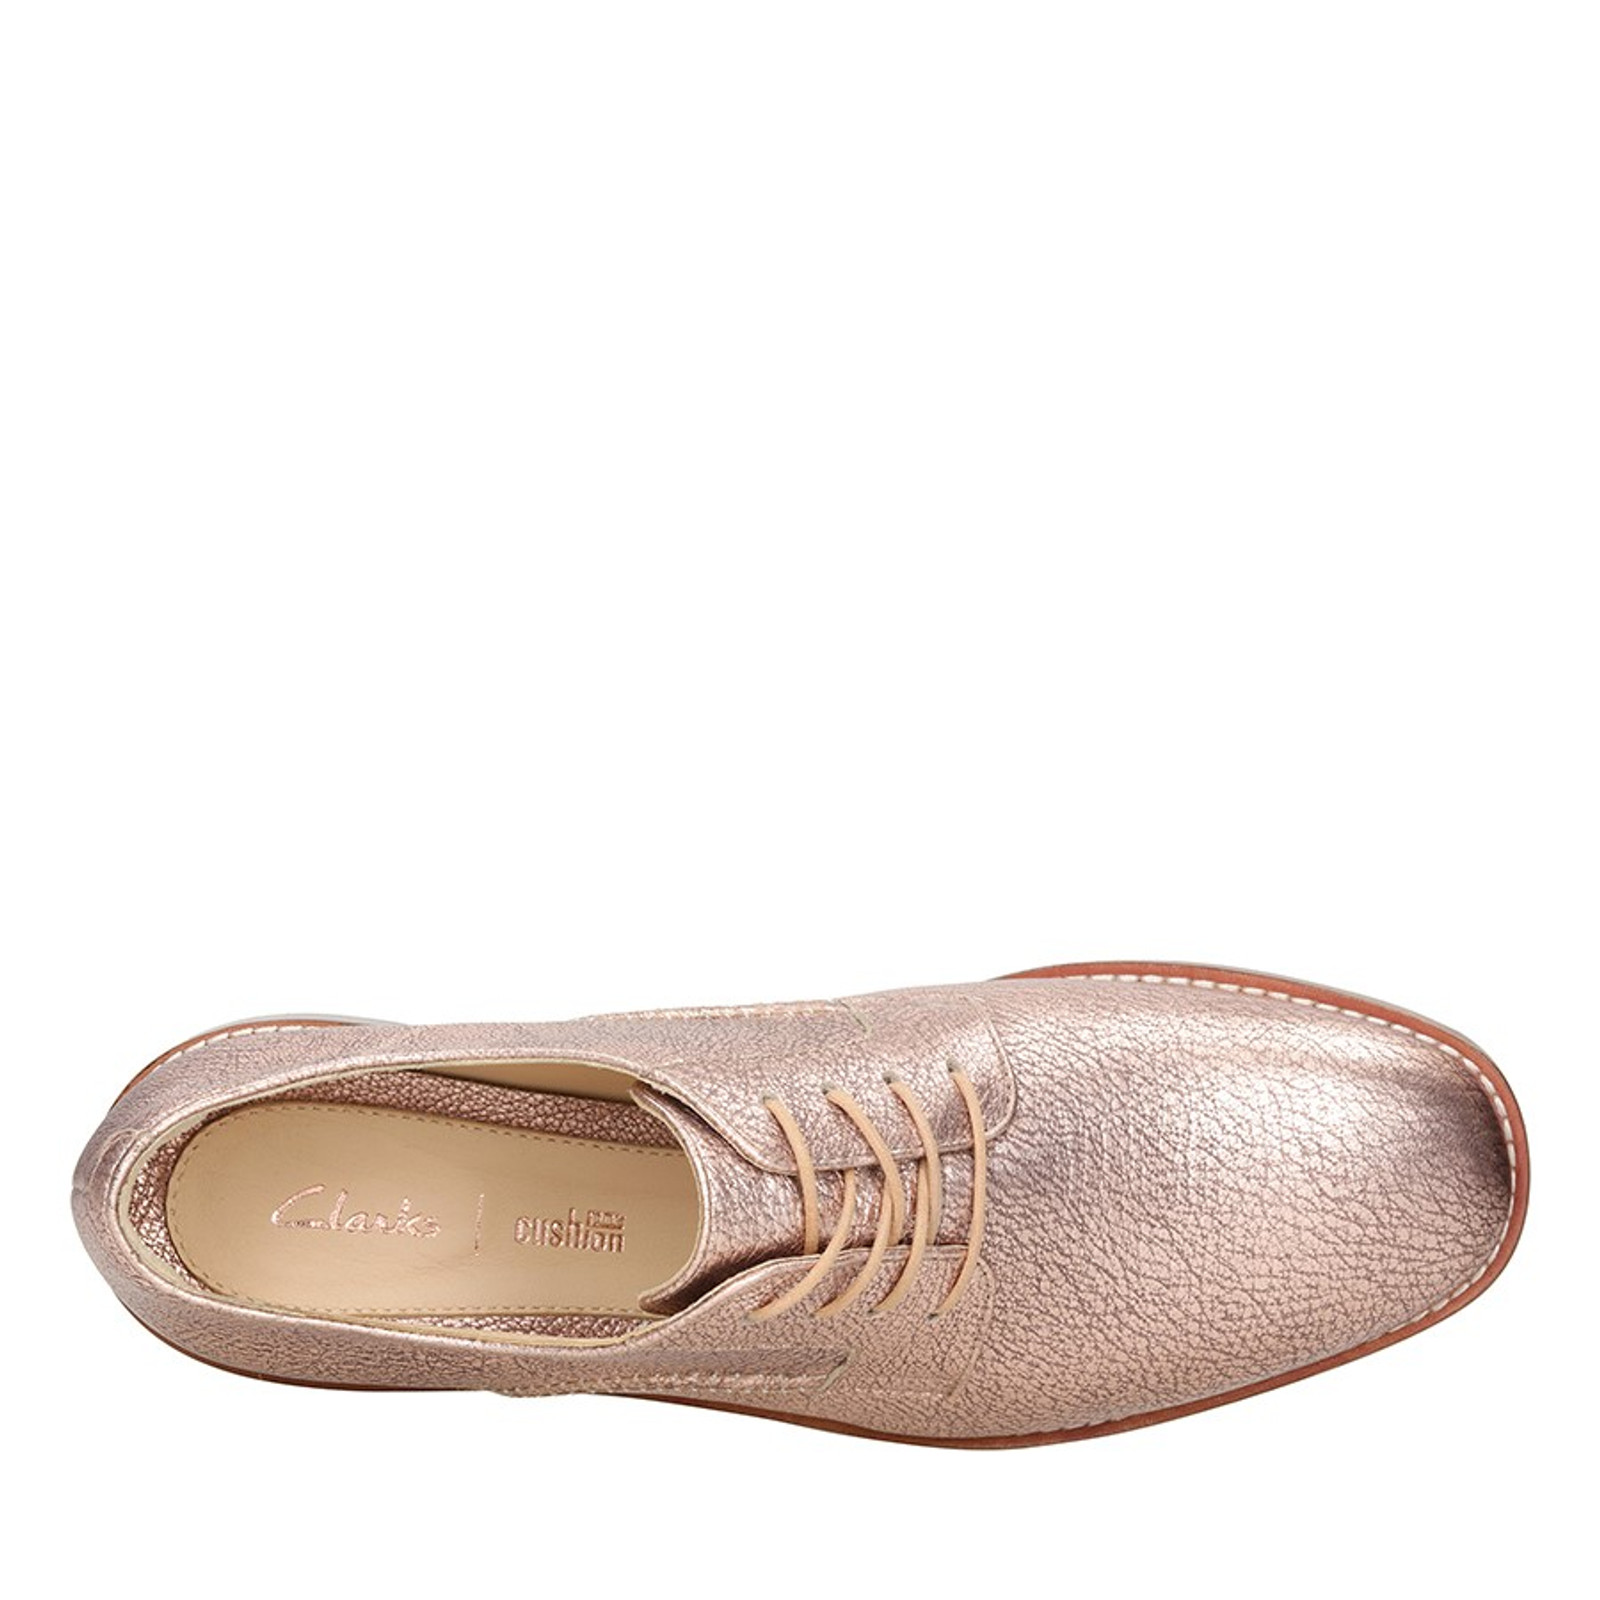 Clarks Womens ELLIS SCARLETT Rose Gold Leather